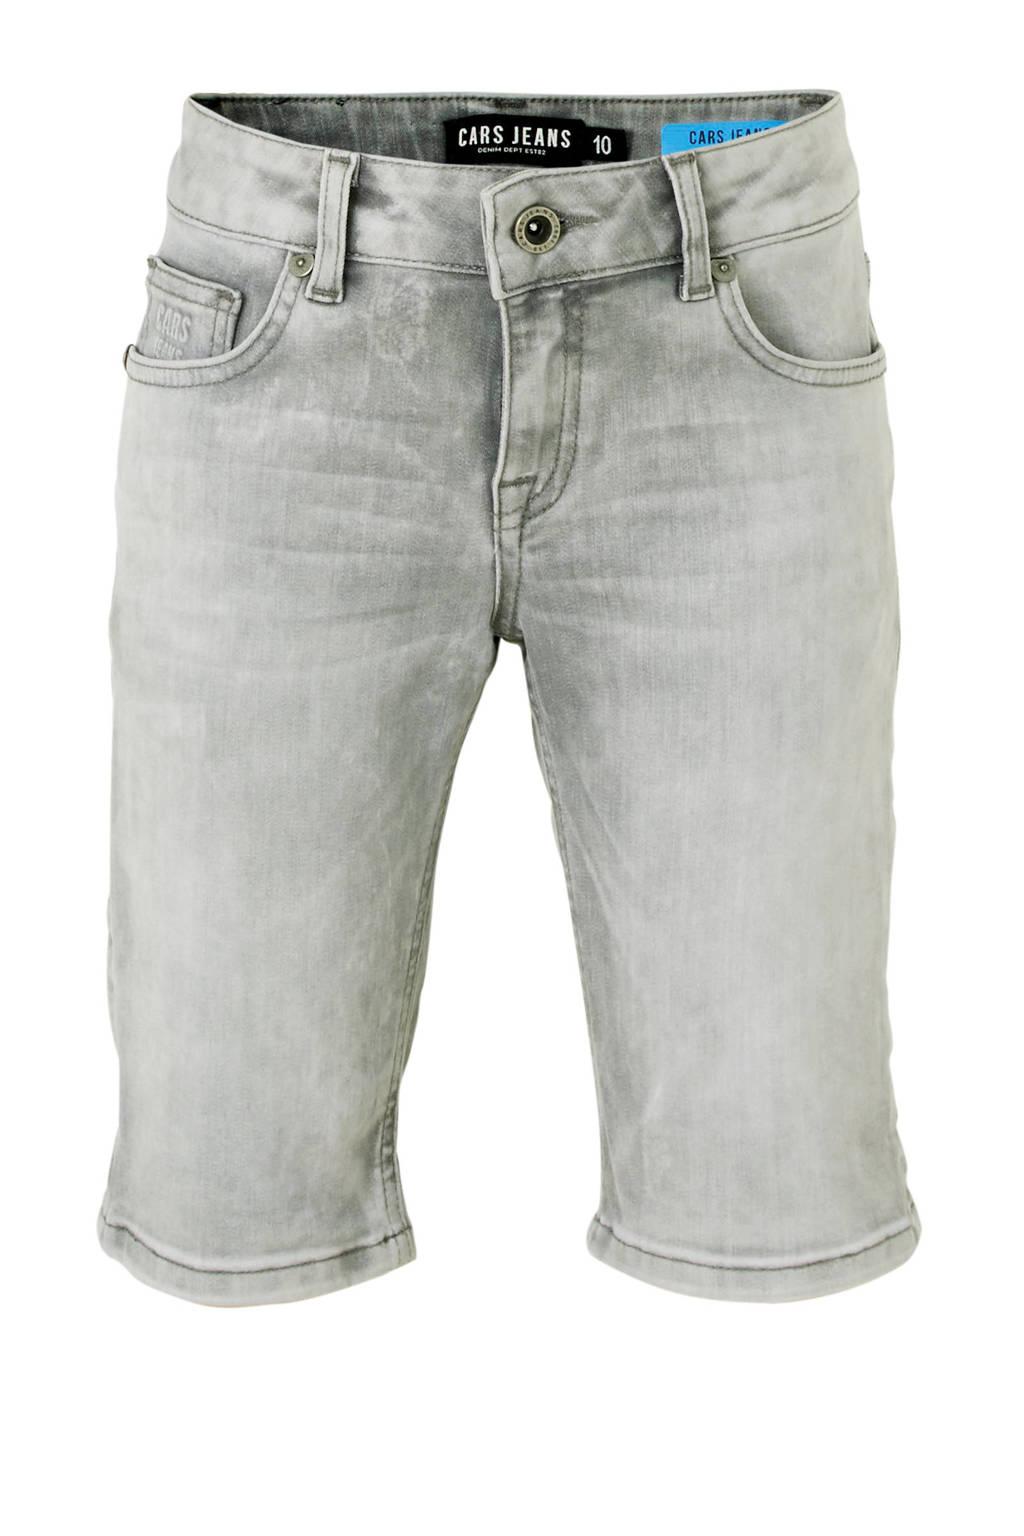 Cars jeans bermuda Tranes grijs, Grijs